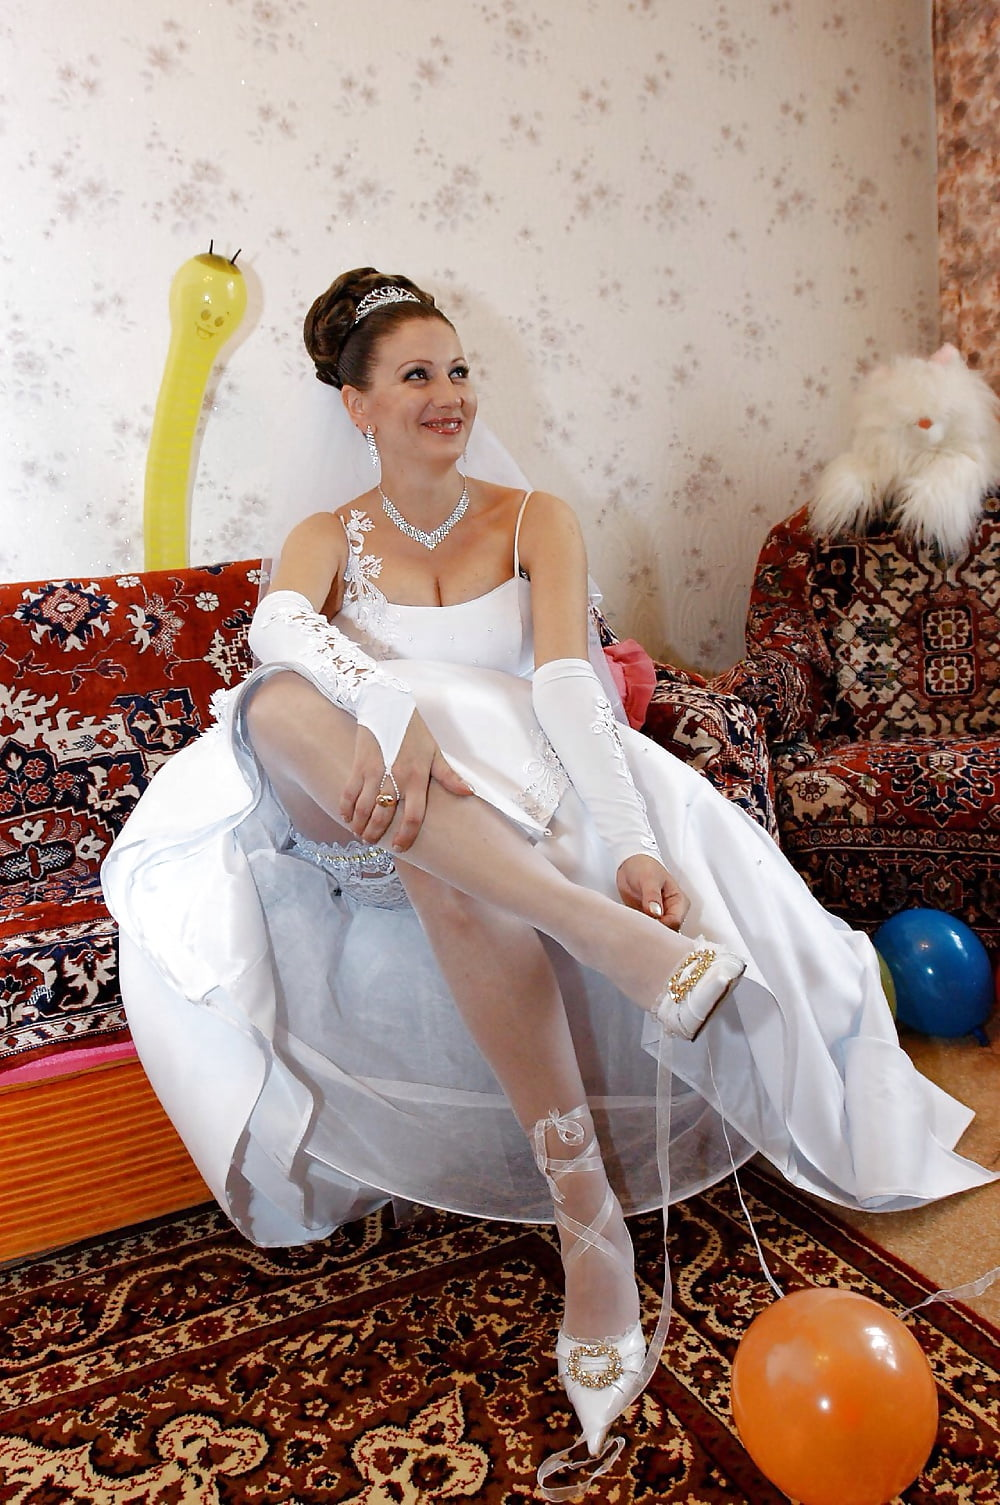 Russian Brides For Sale